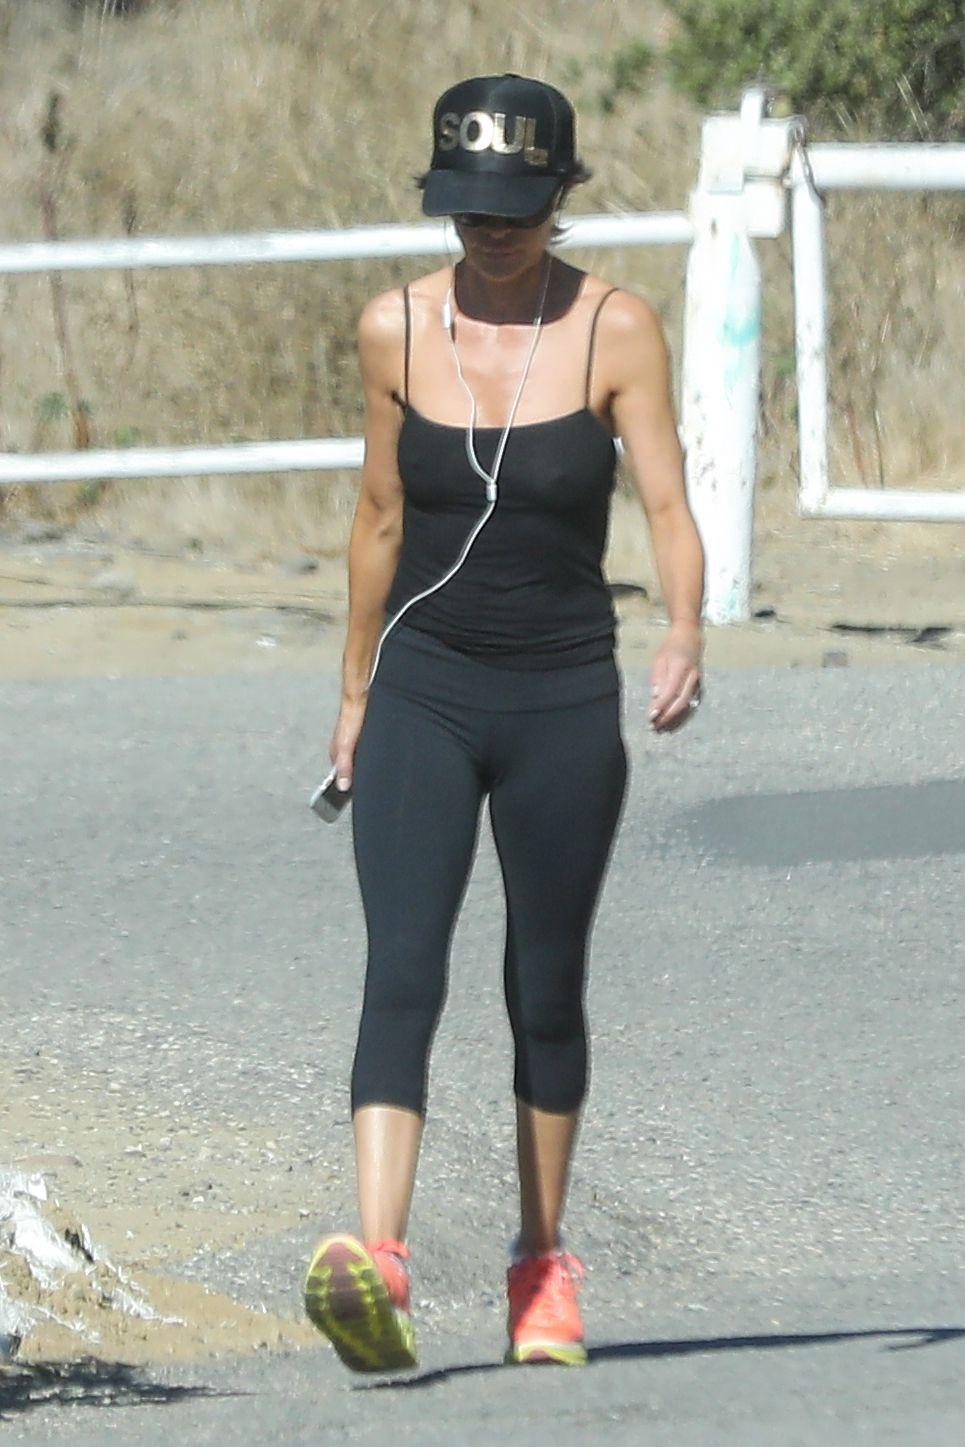 [PICS] Soap Opera Actress Lisa Rinna iCloud Leak • Page 3